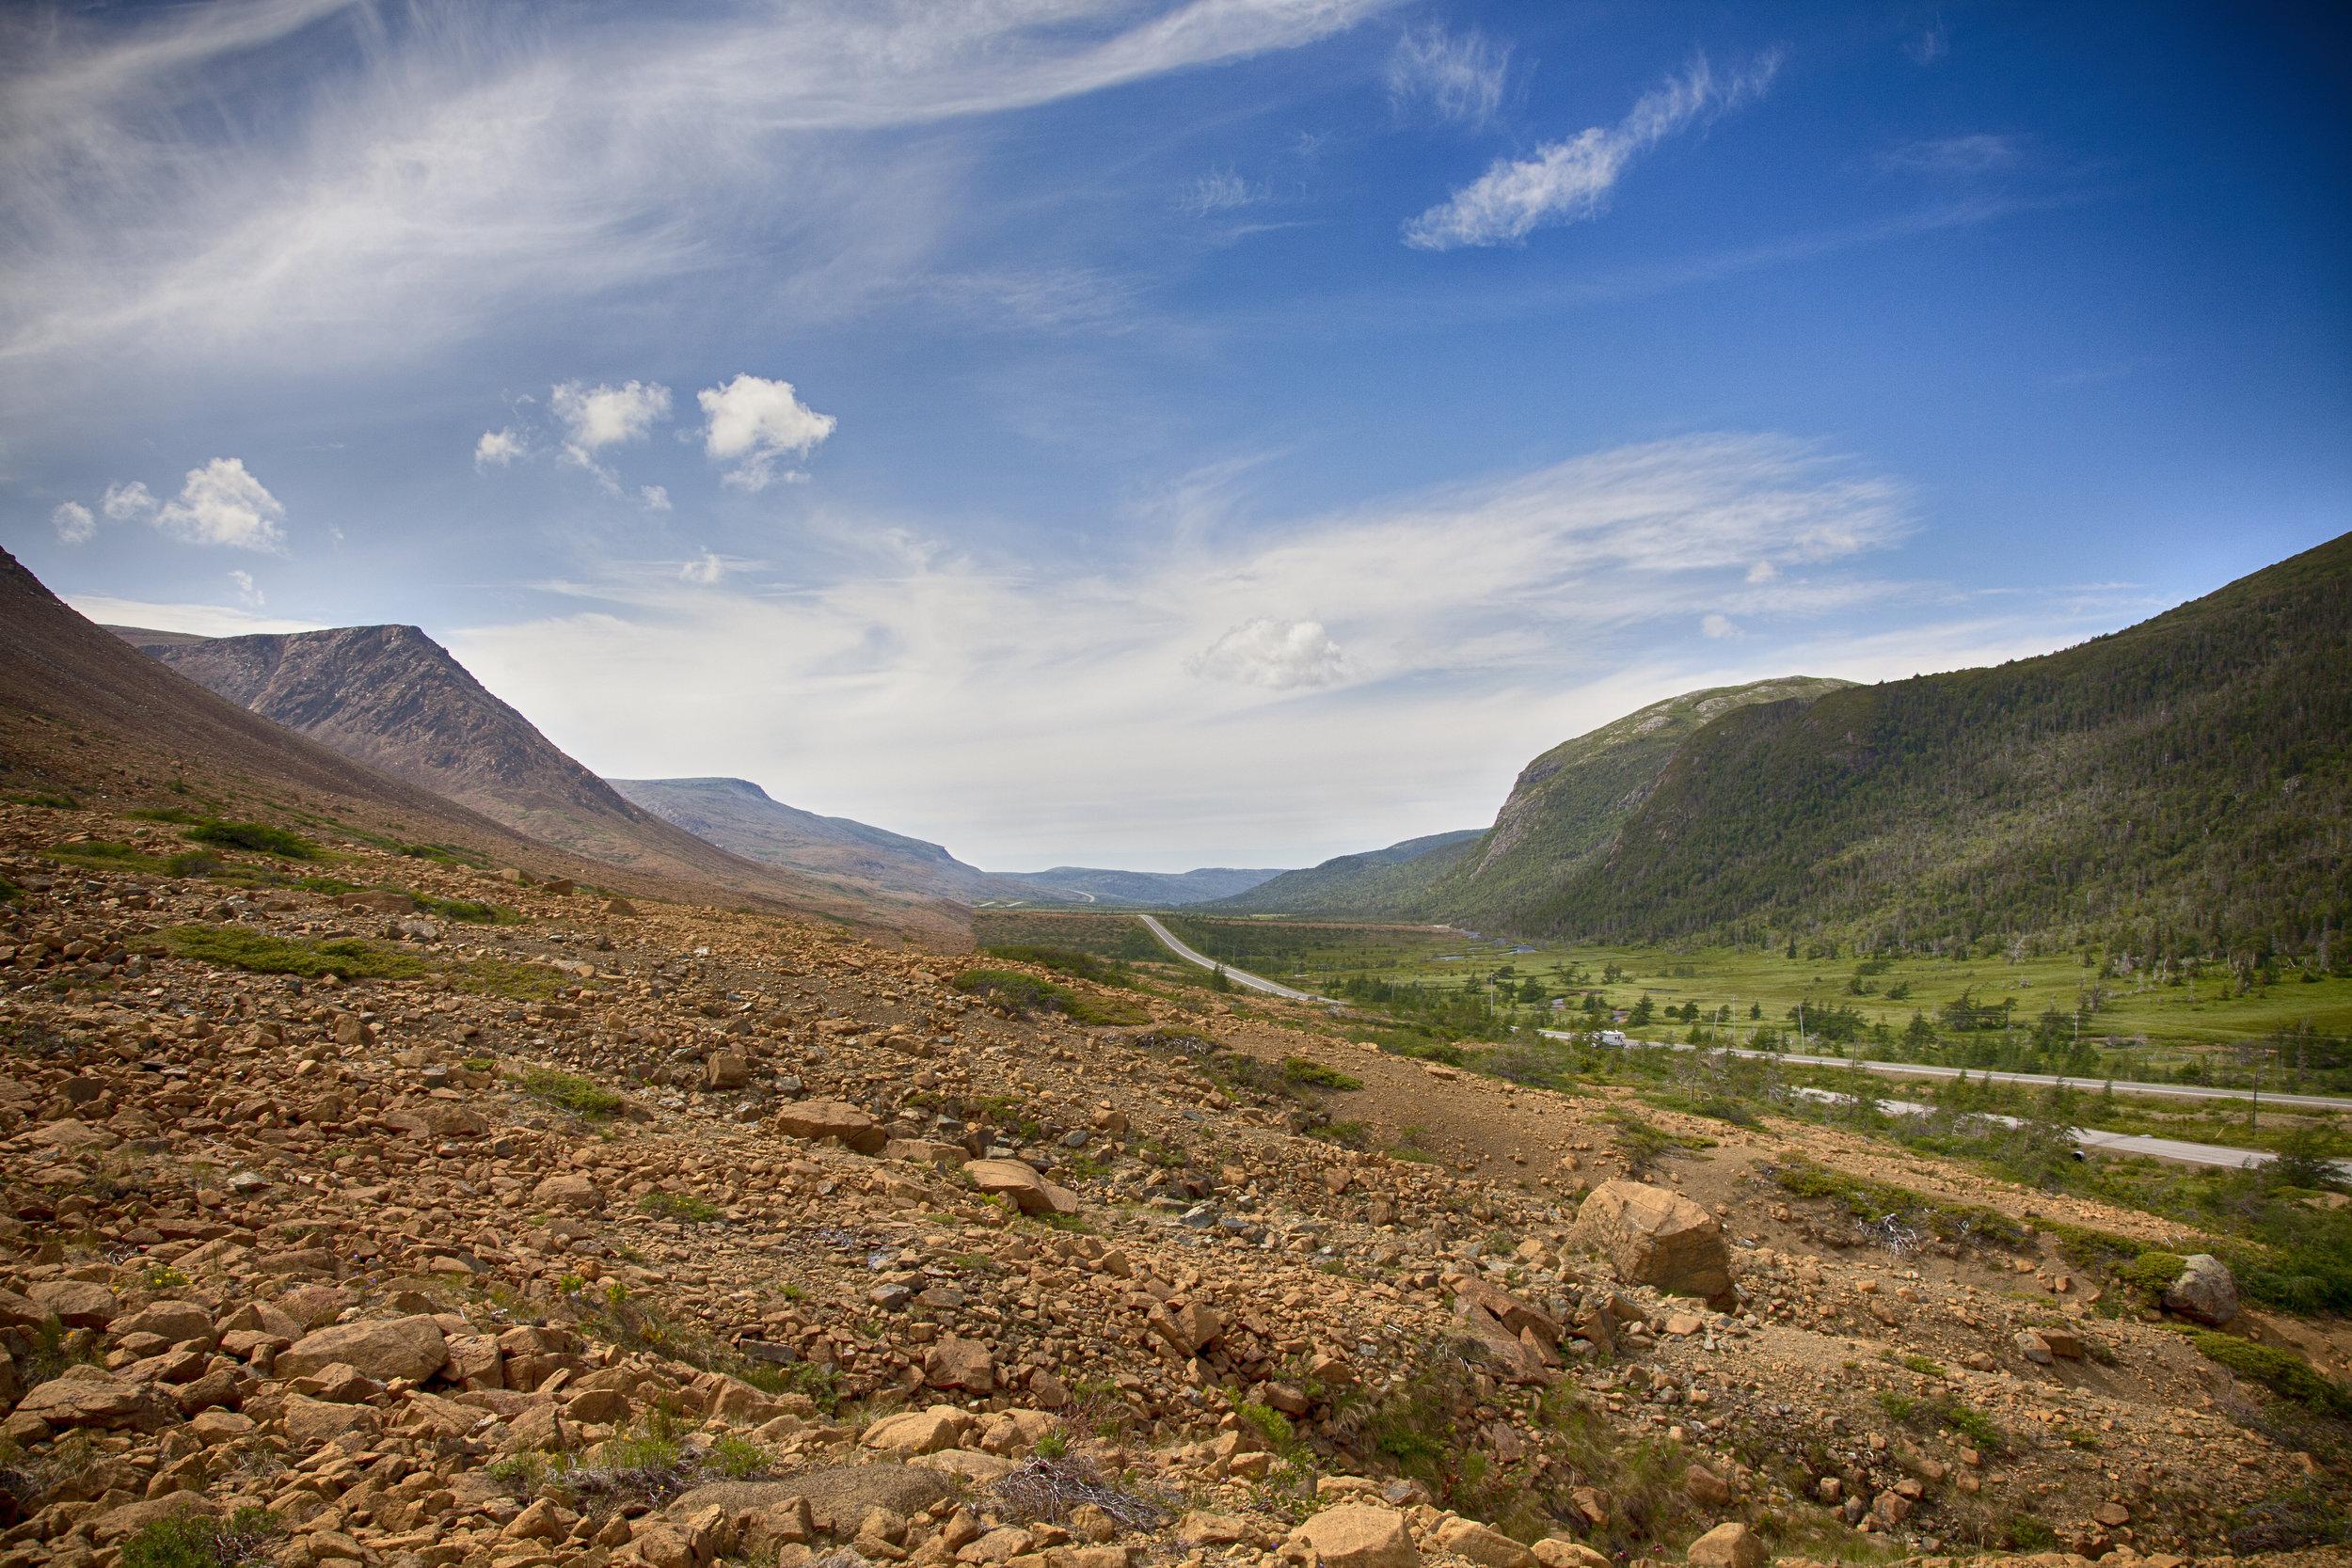 Gros Morne National Park - Across the Blue Planet